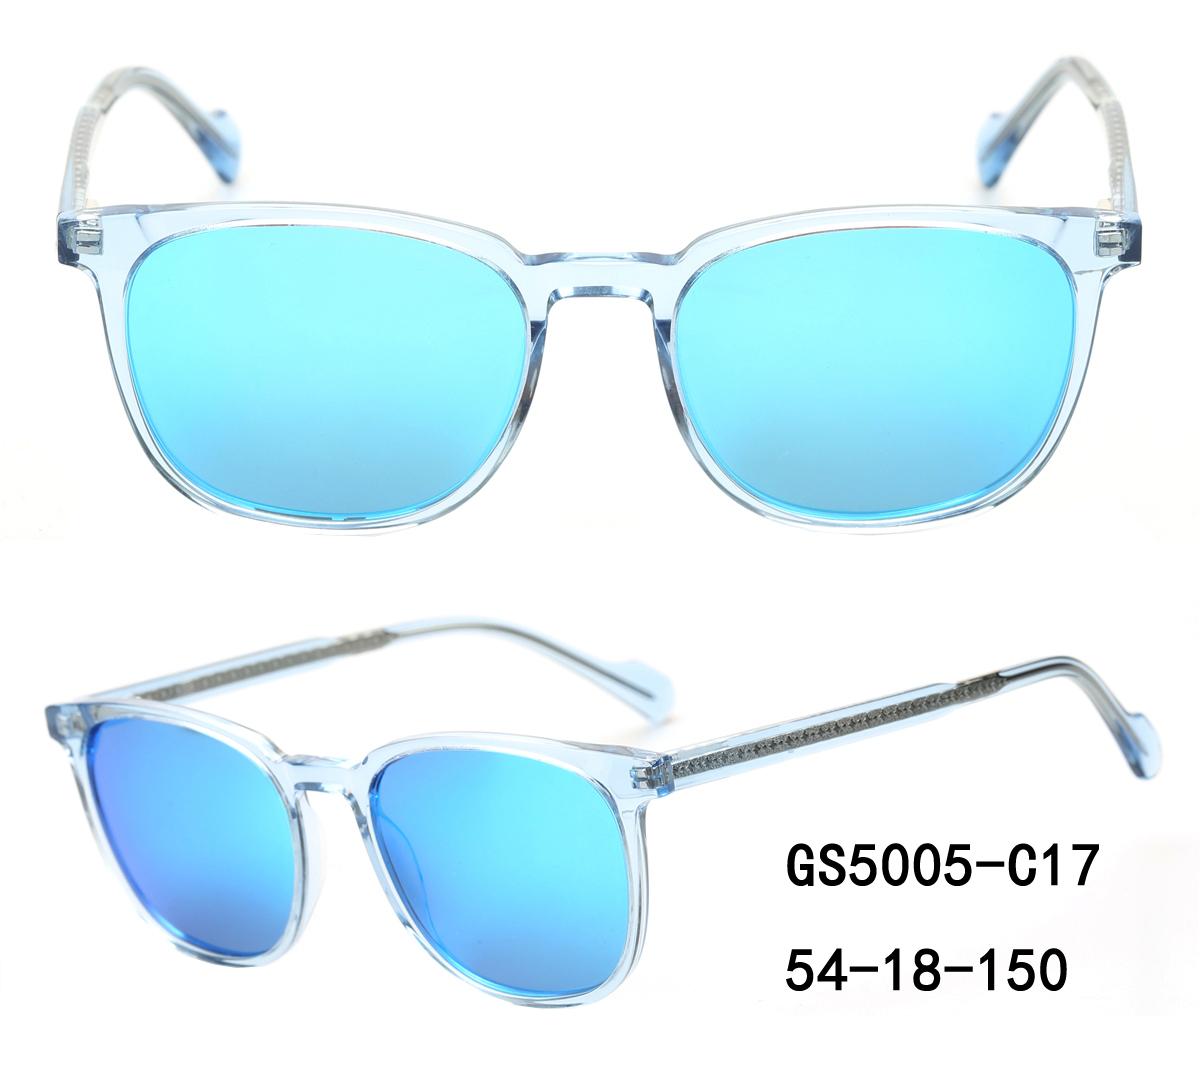 Square Polarized Acetate Sunglasses Wholesale, Men Women Aquare Sunglasses Oem Odm Price